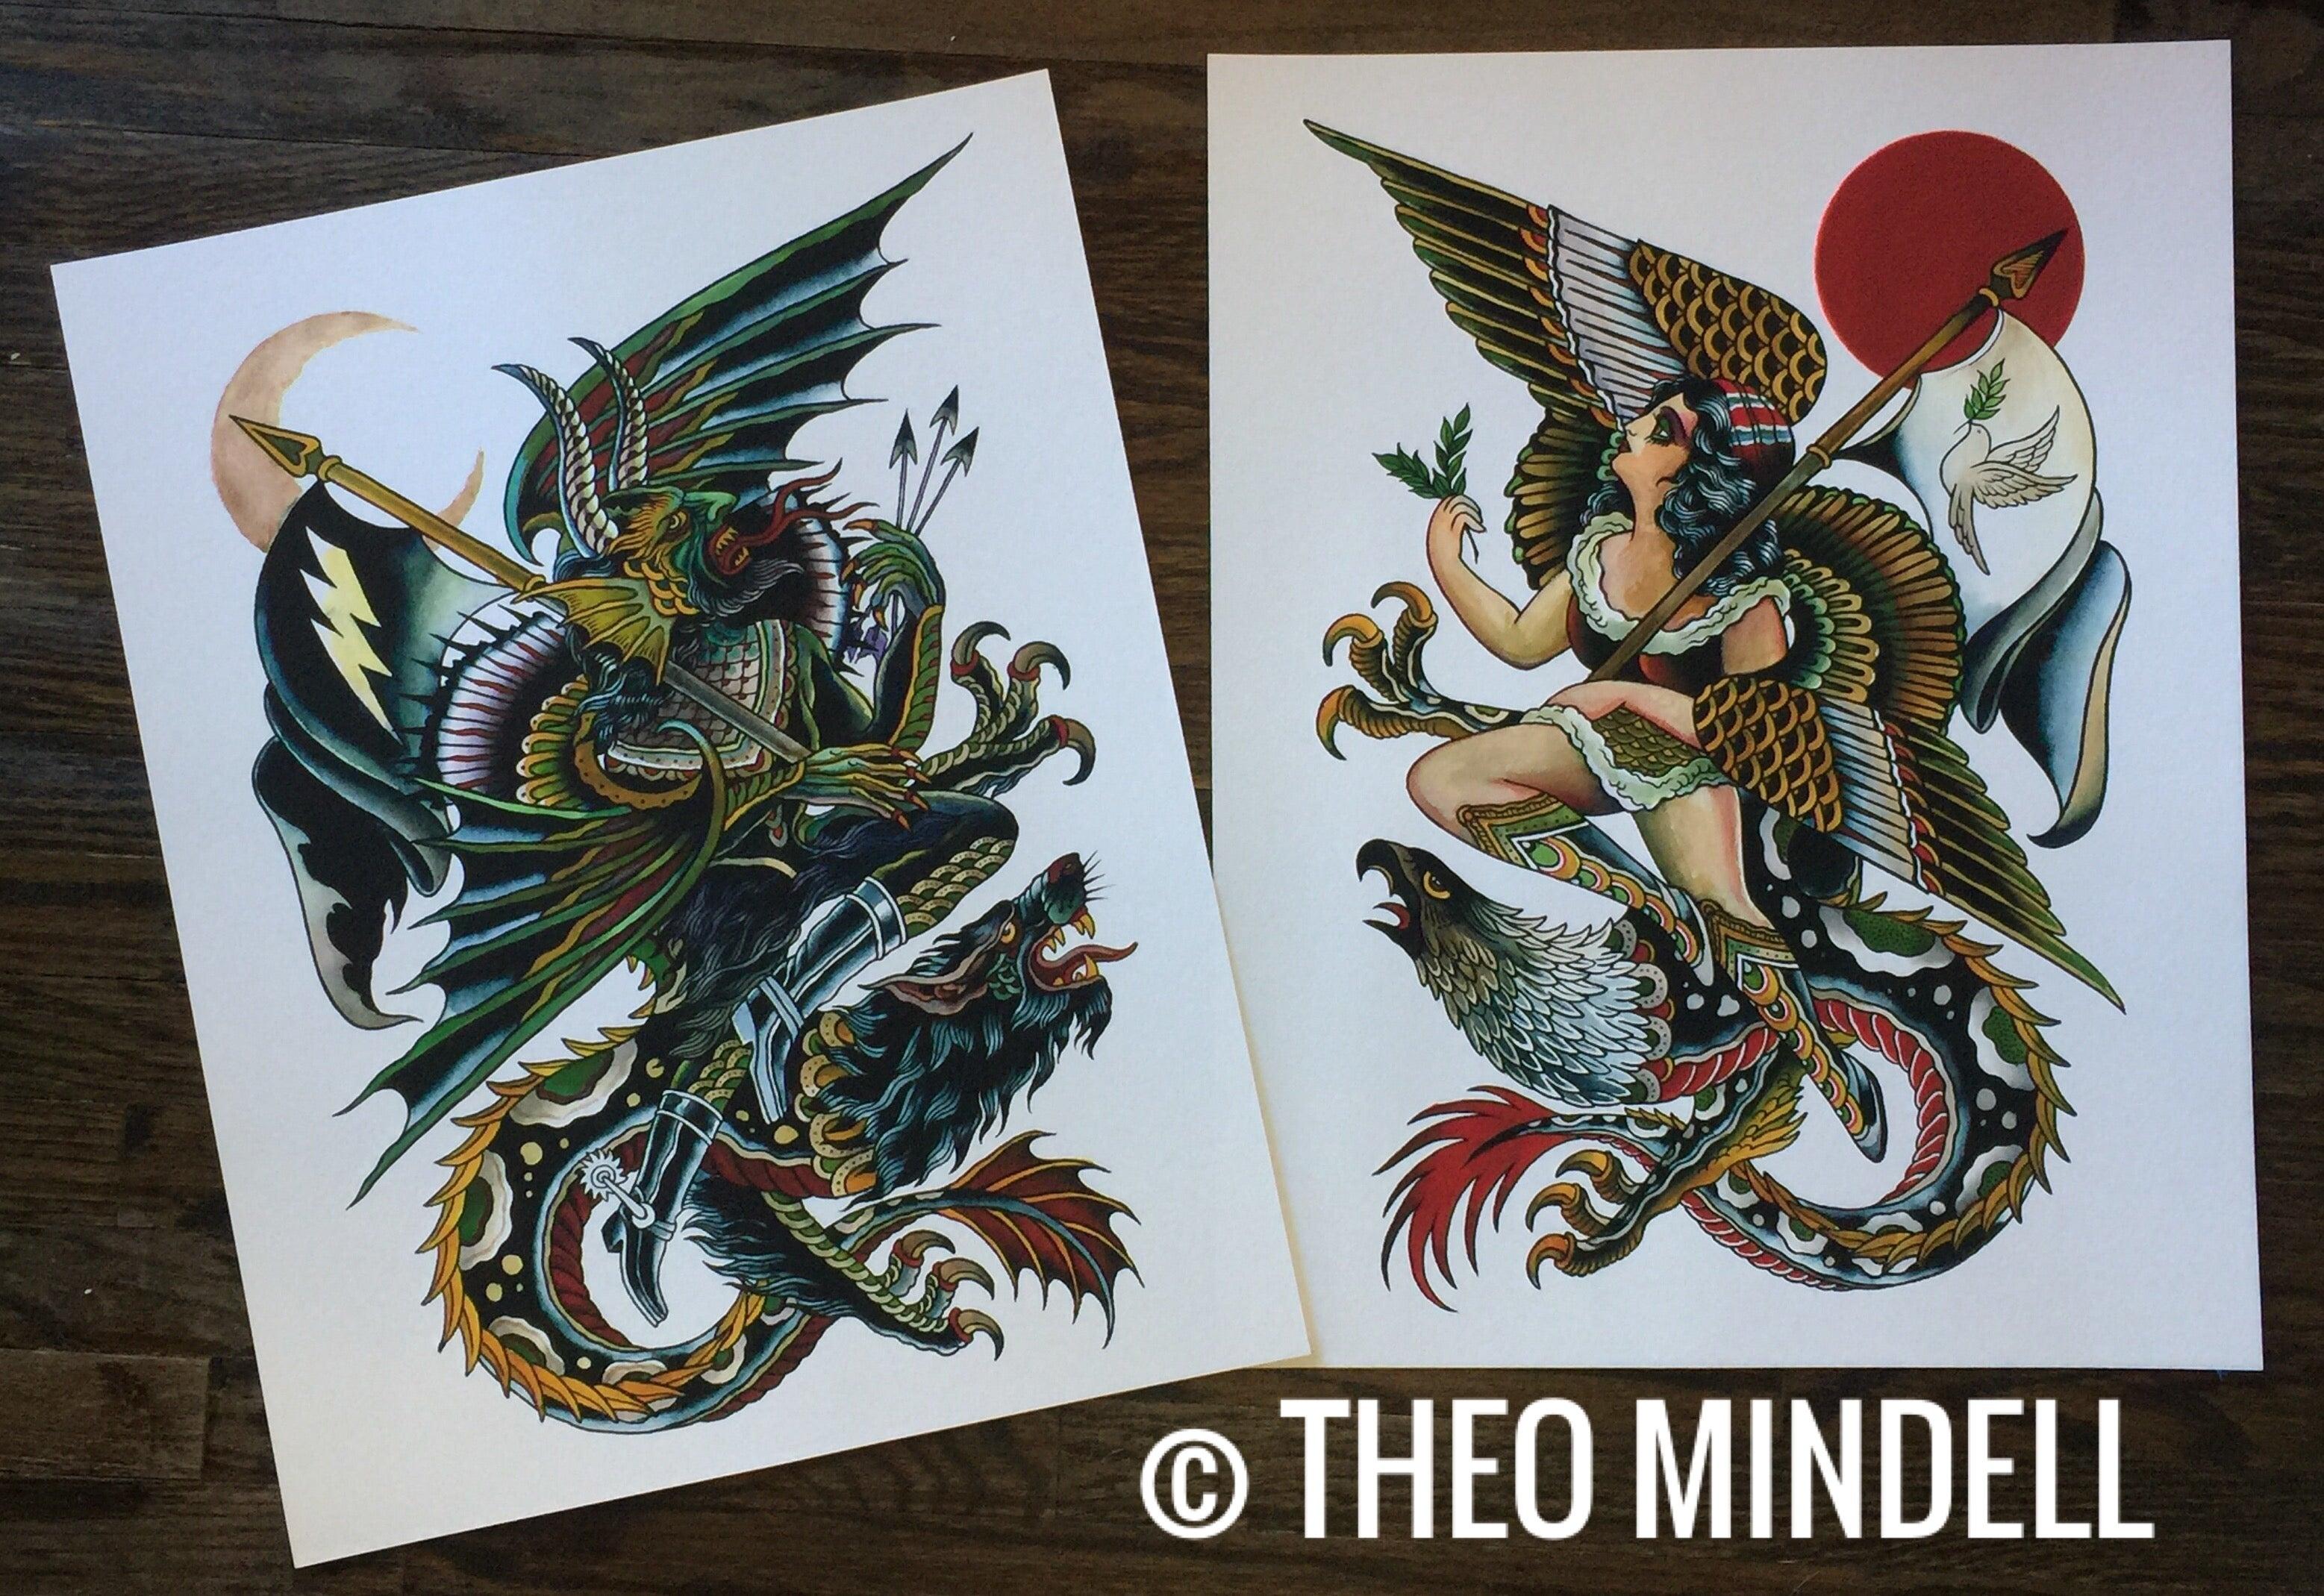 theo mindell prints